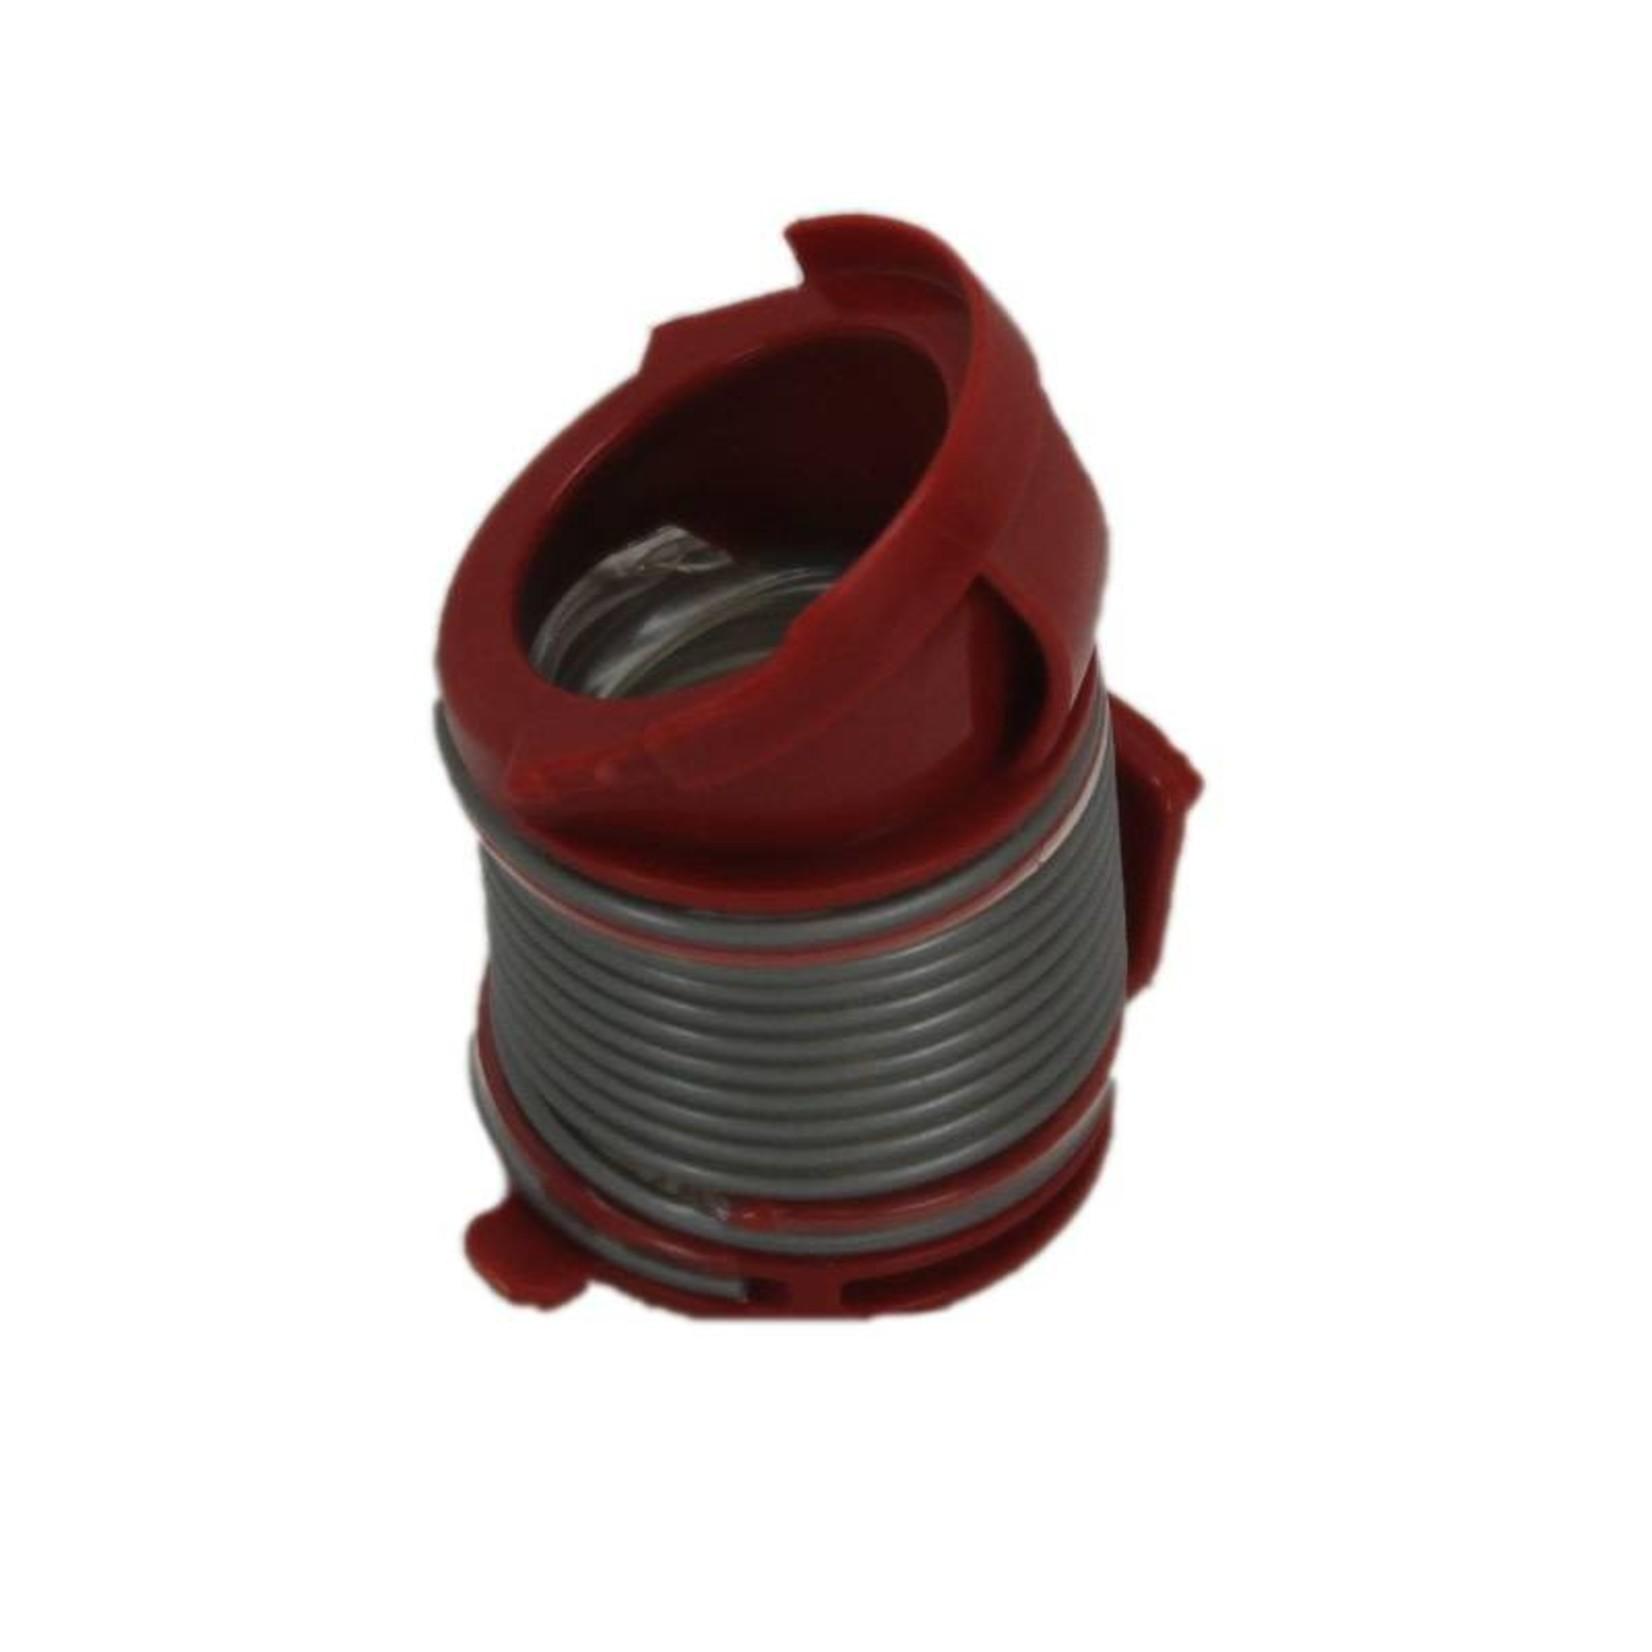 Dyson Dyson DC50 Lower Internal Red/Gray Hose